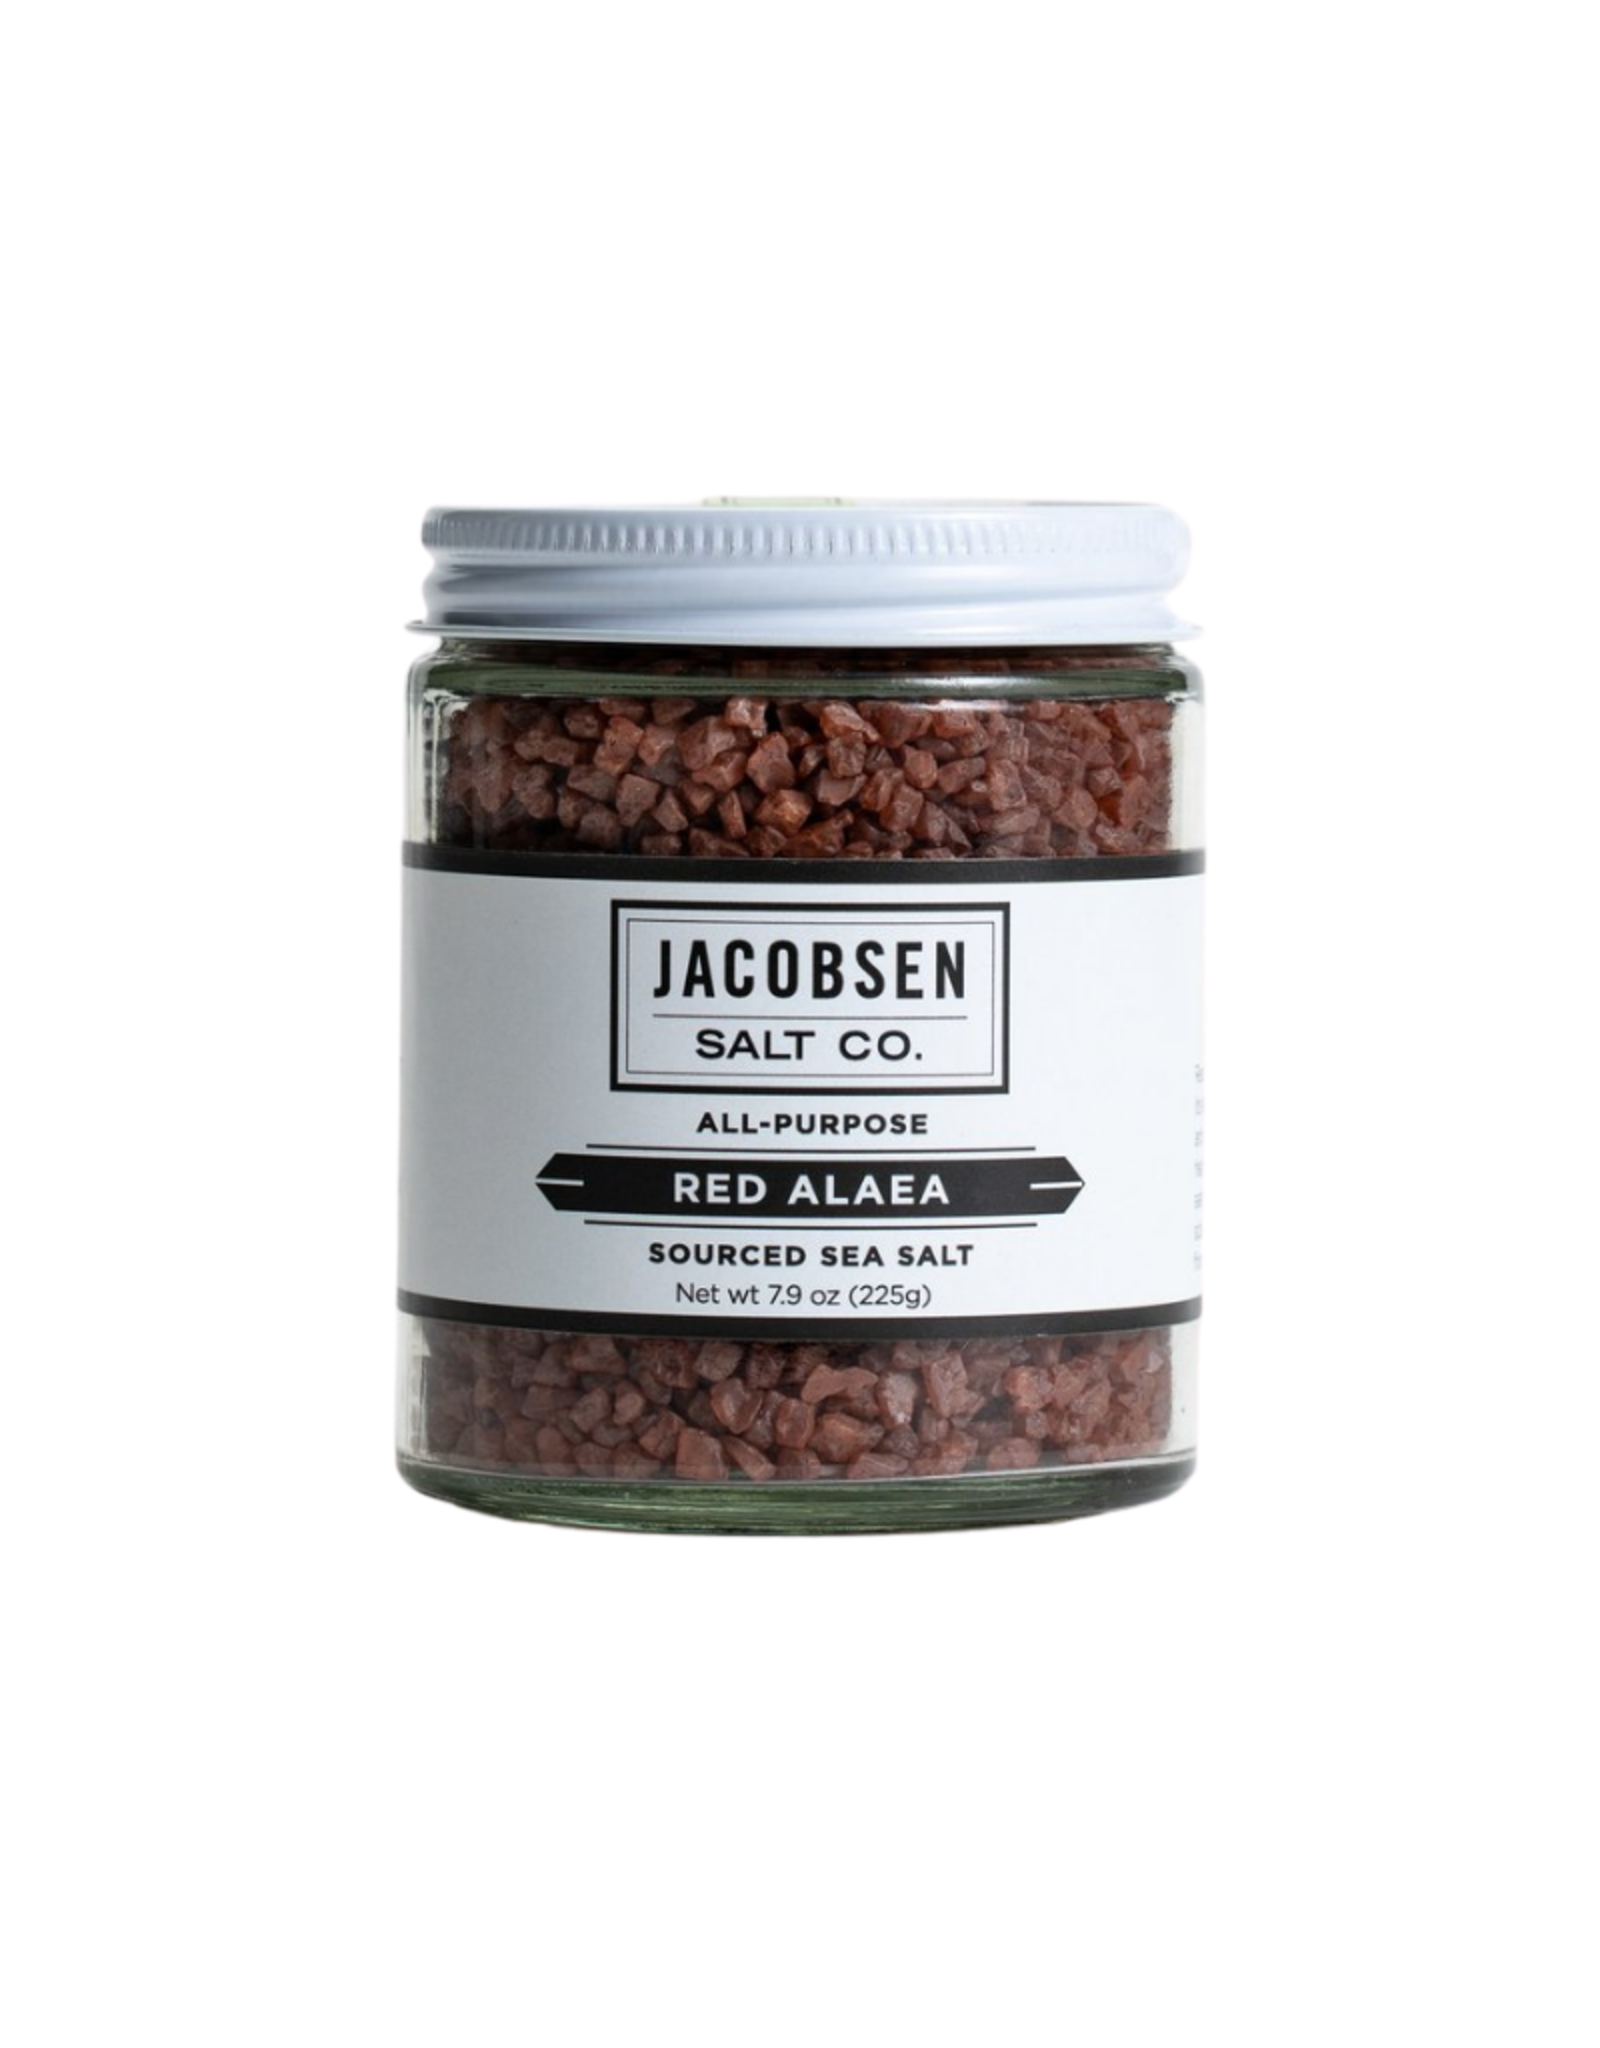 Jacobsen Salt Co. Red Alaea Sourced Sea Salt